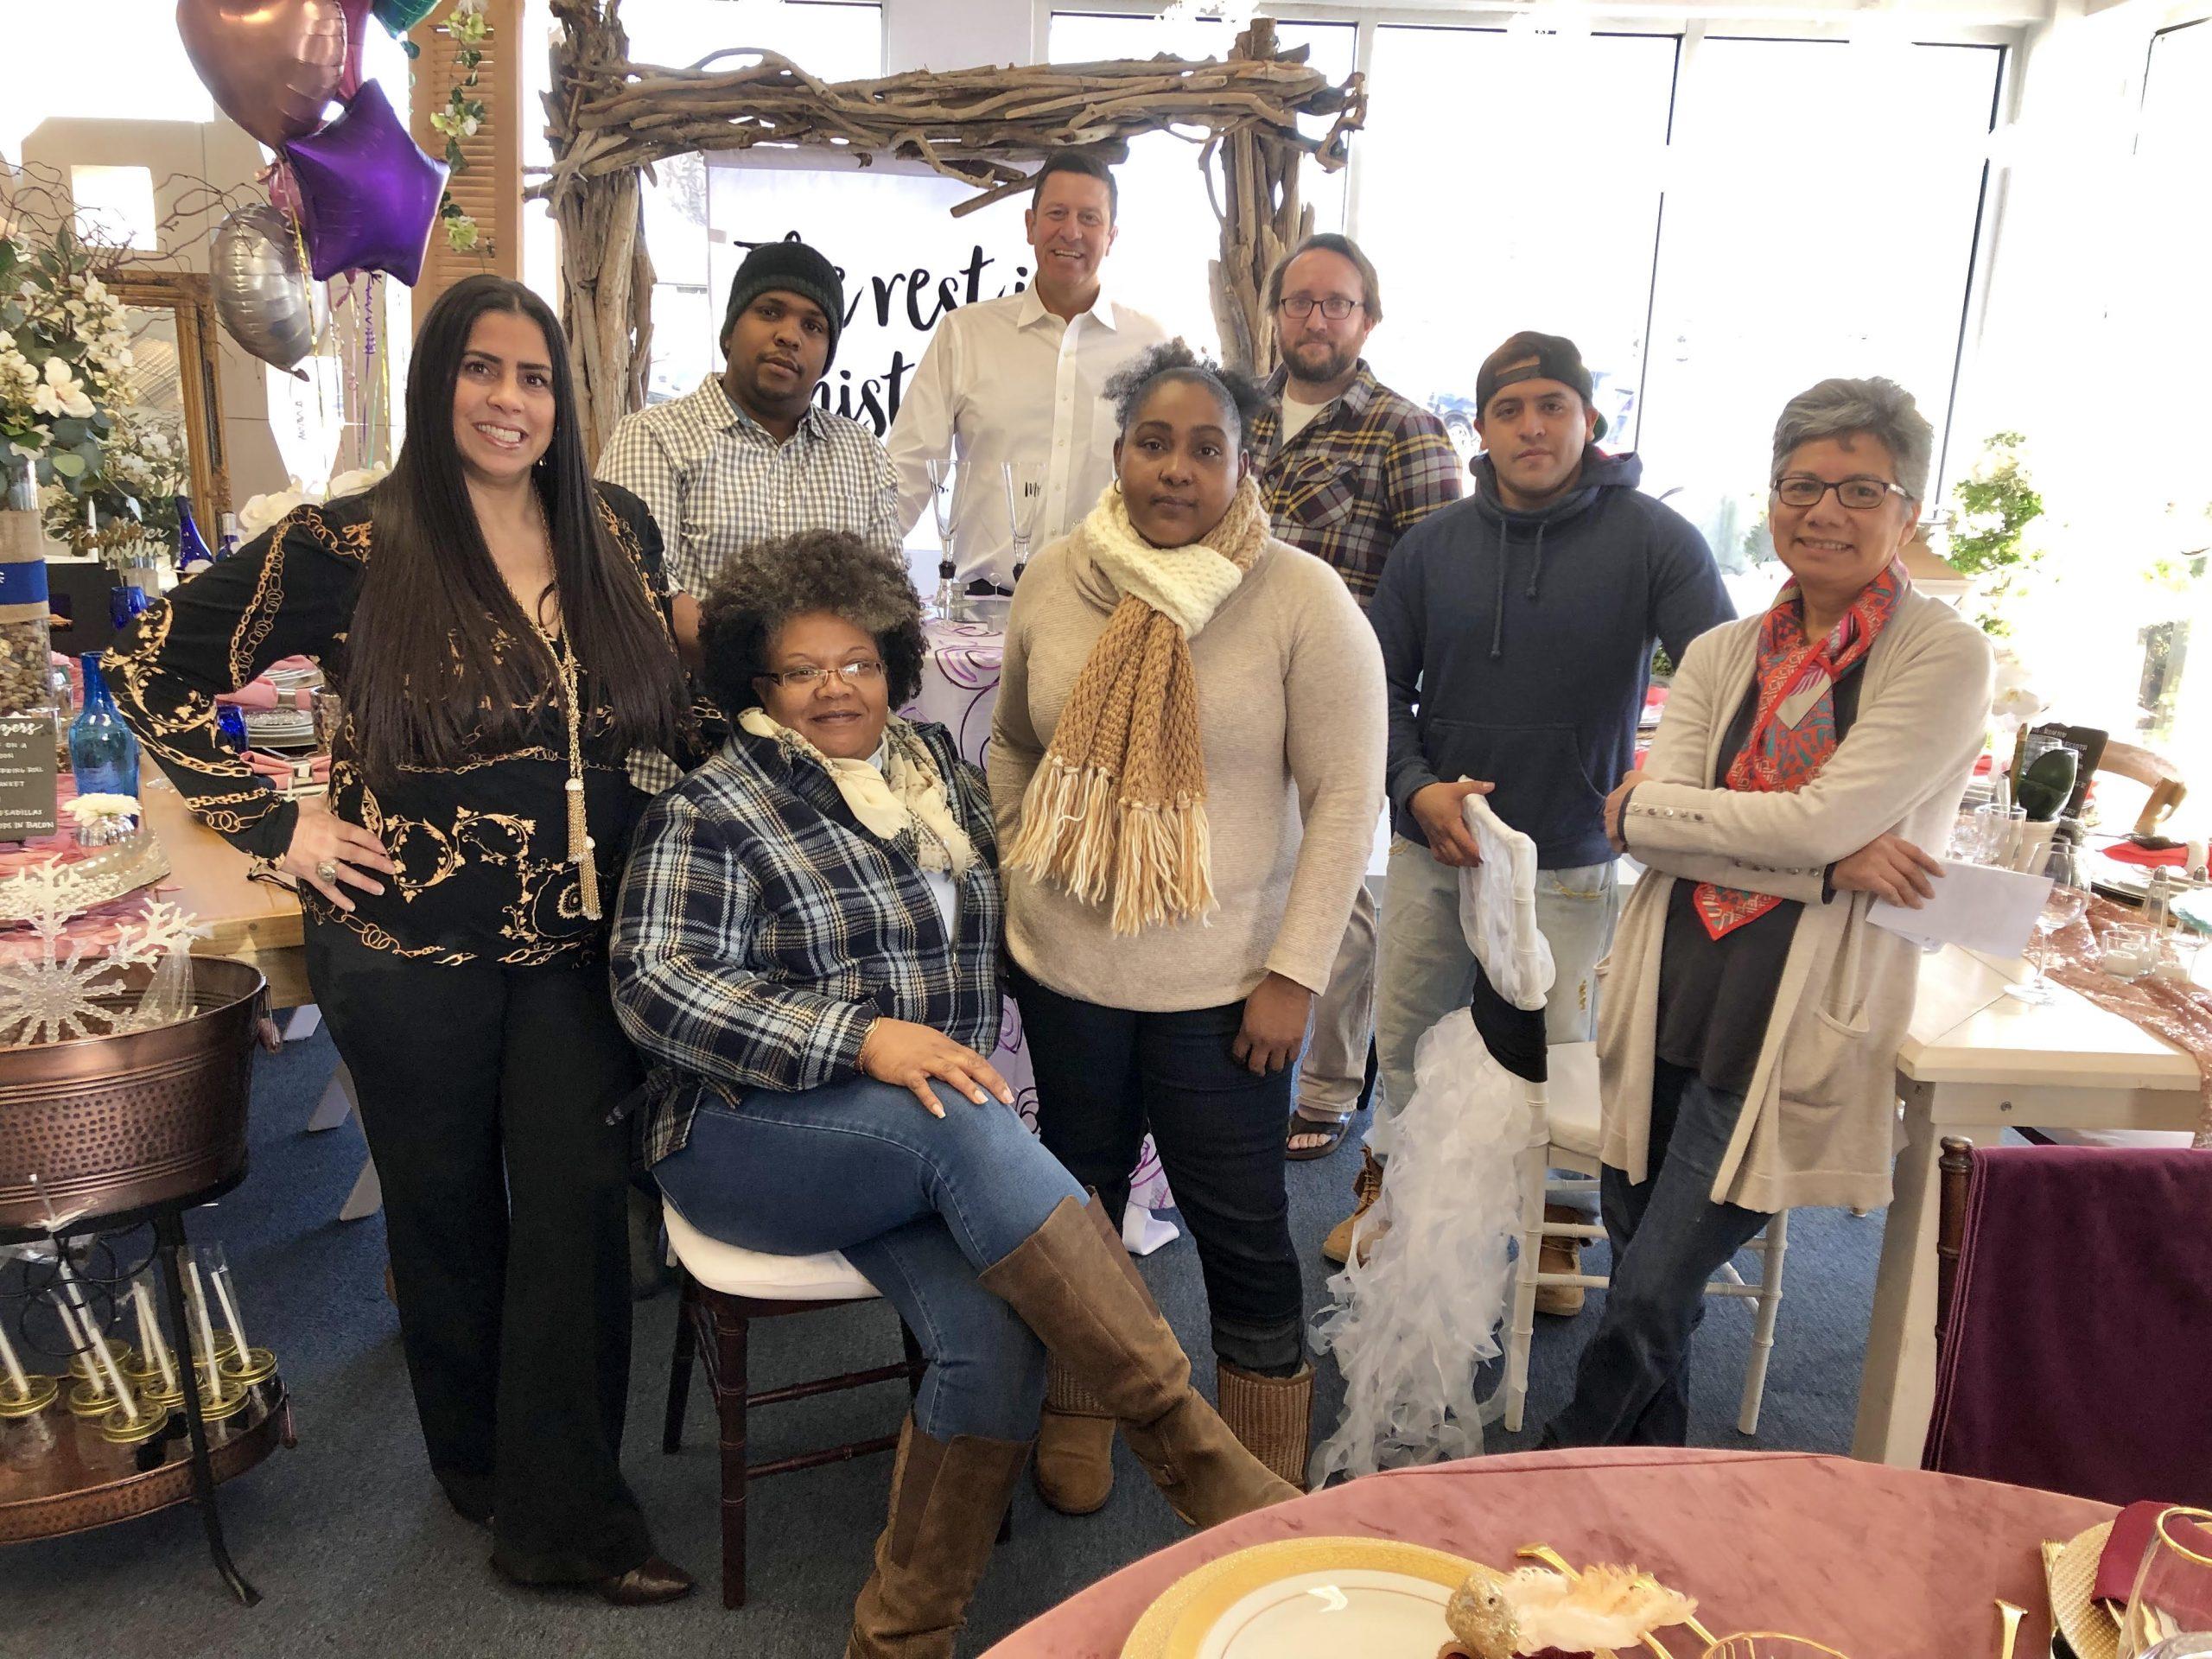 Party Corner in Shrewsbury NJ Celebrates 50 Years